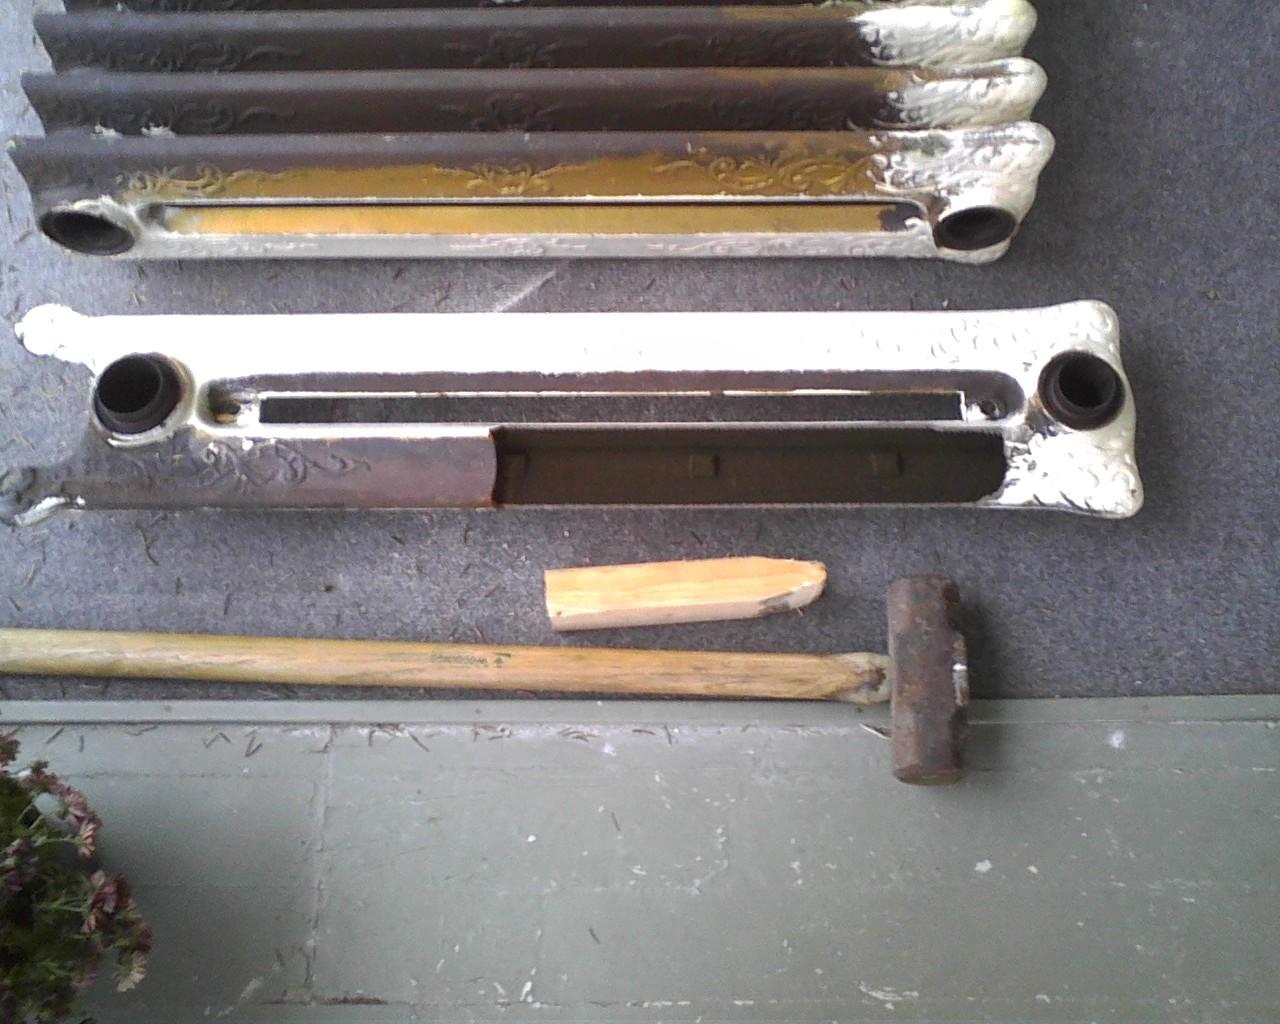 Delightful Photo11121117 305.7K. Tagged: Cast Iron Radiator ...